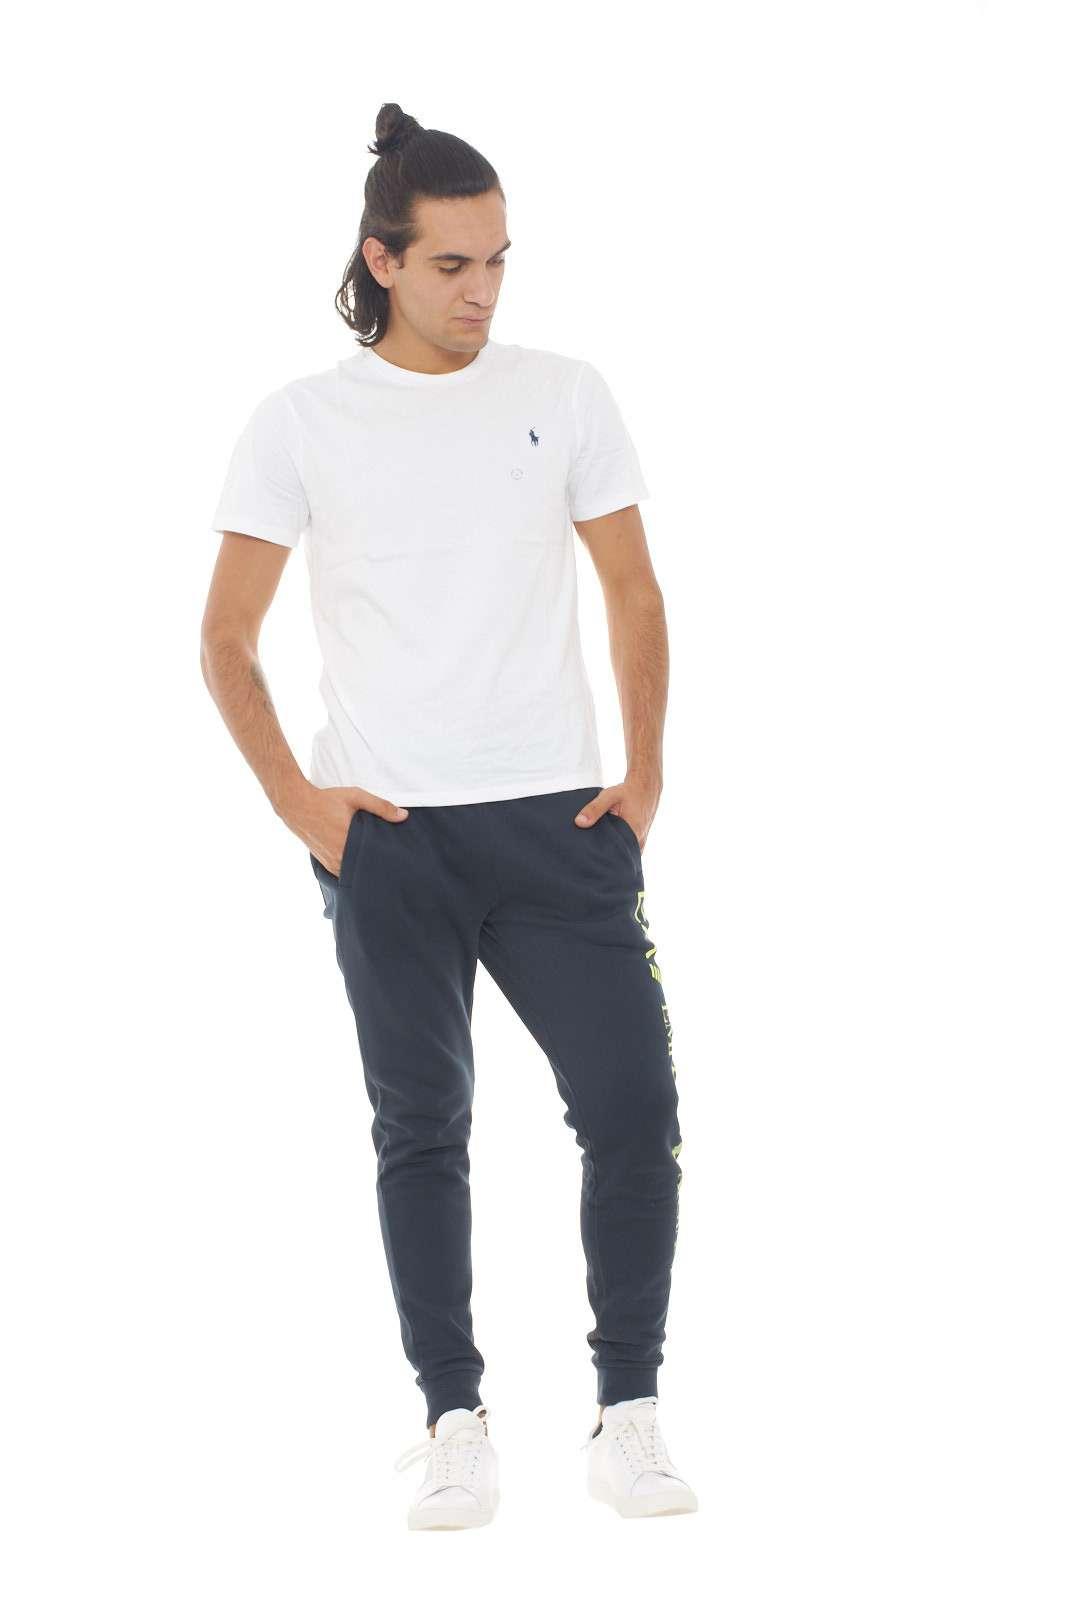 https://www.parmax.com/media/catalog/product/a/i/AI-outlet_parmax-pantaloni-uomo-Emporio-Armani-8NPPB5-D.jpg